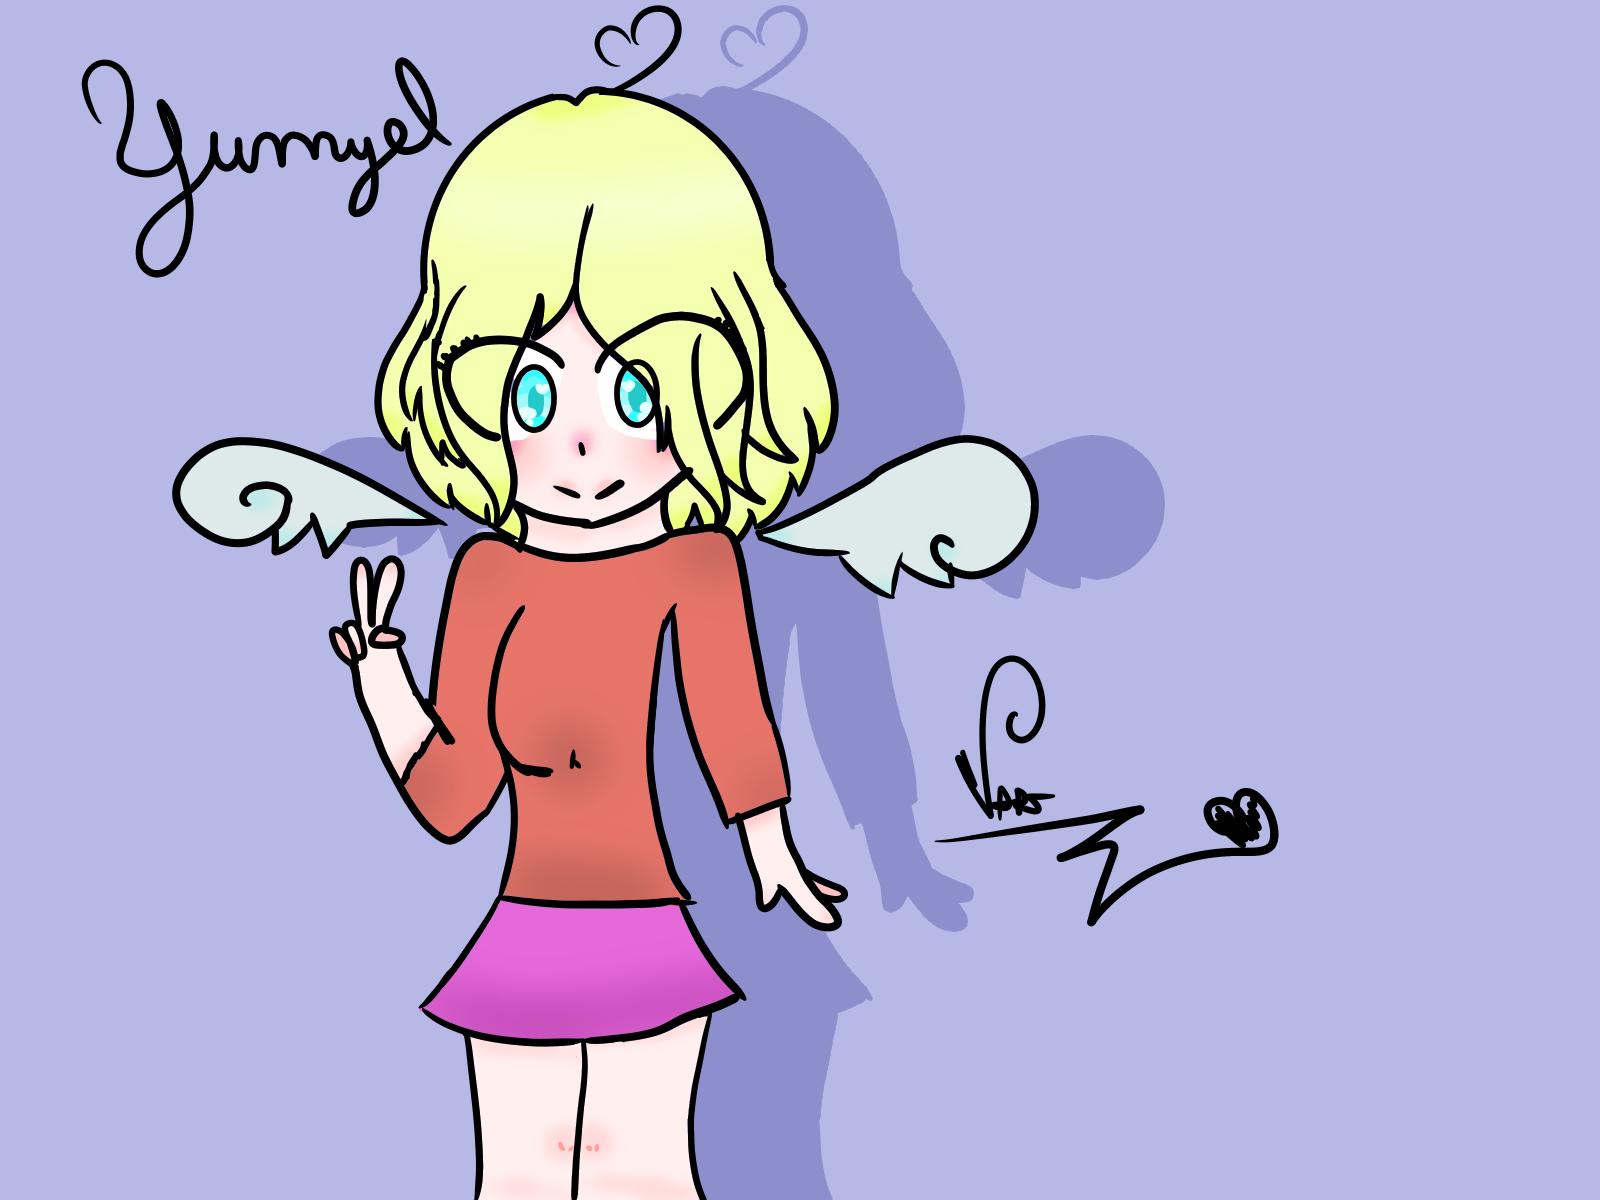 Yumyel by CherryHauntter